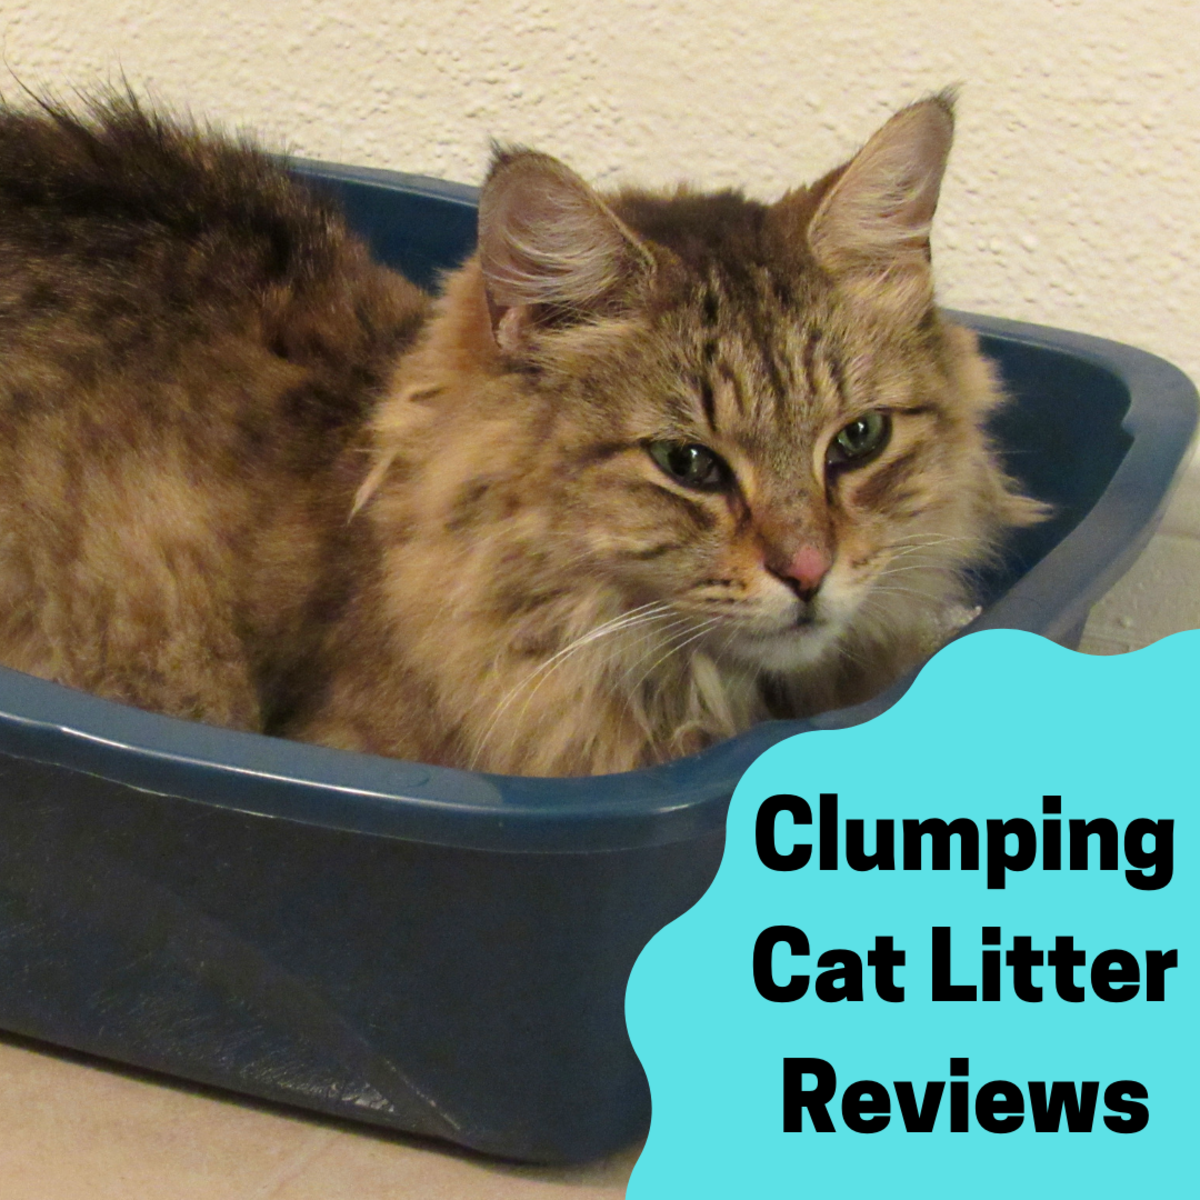 Cat Litter Reviews: Brand Reviews and the Best Clumping Litter